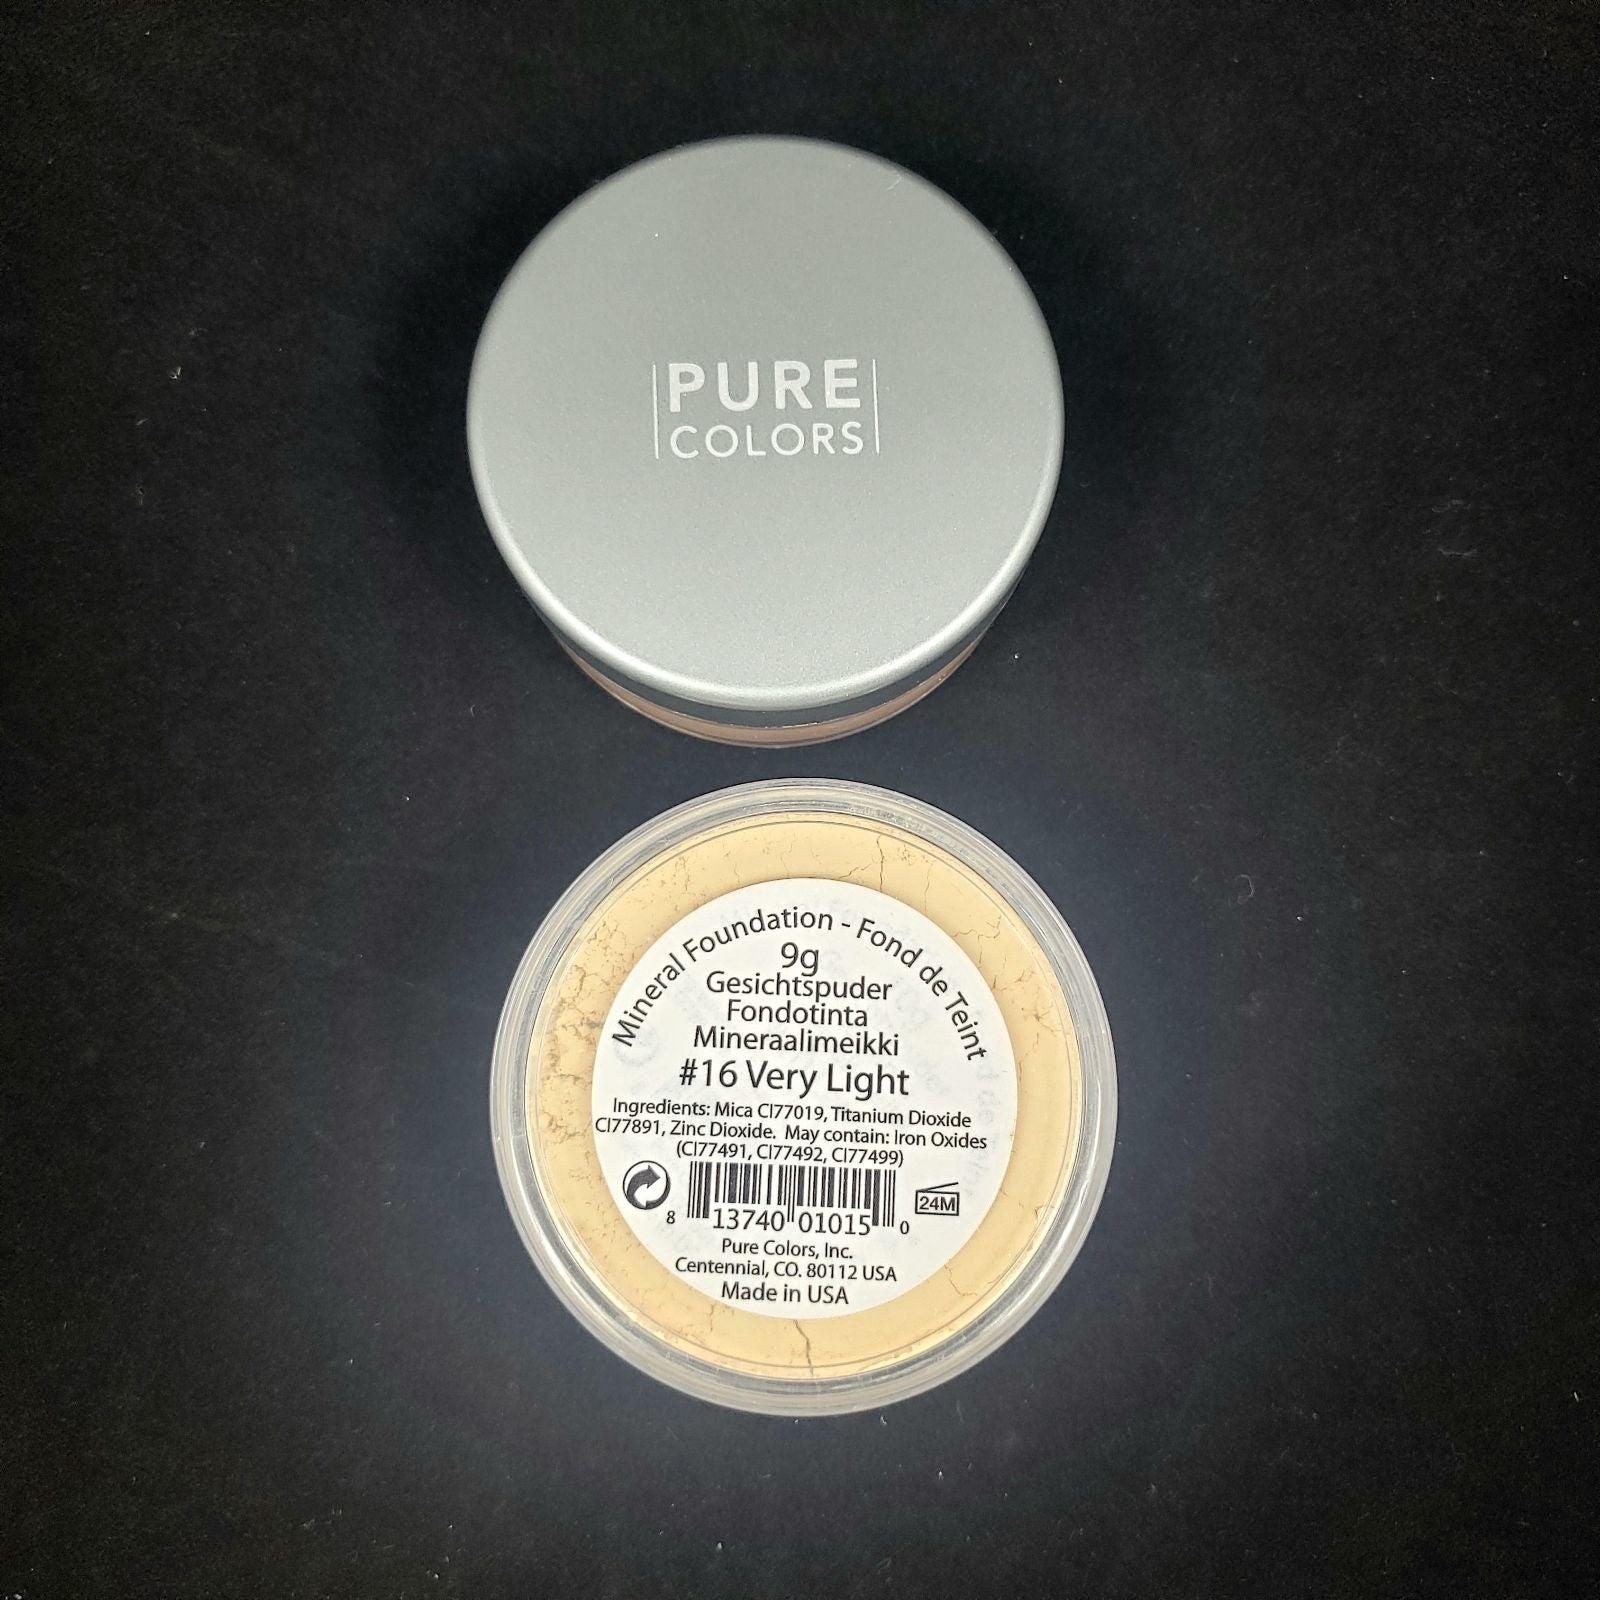 Pure Color #16 Very Light Mineral Founda